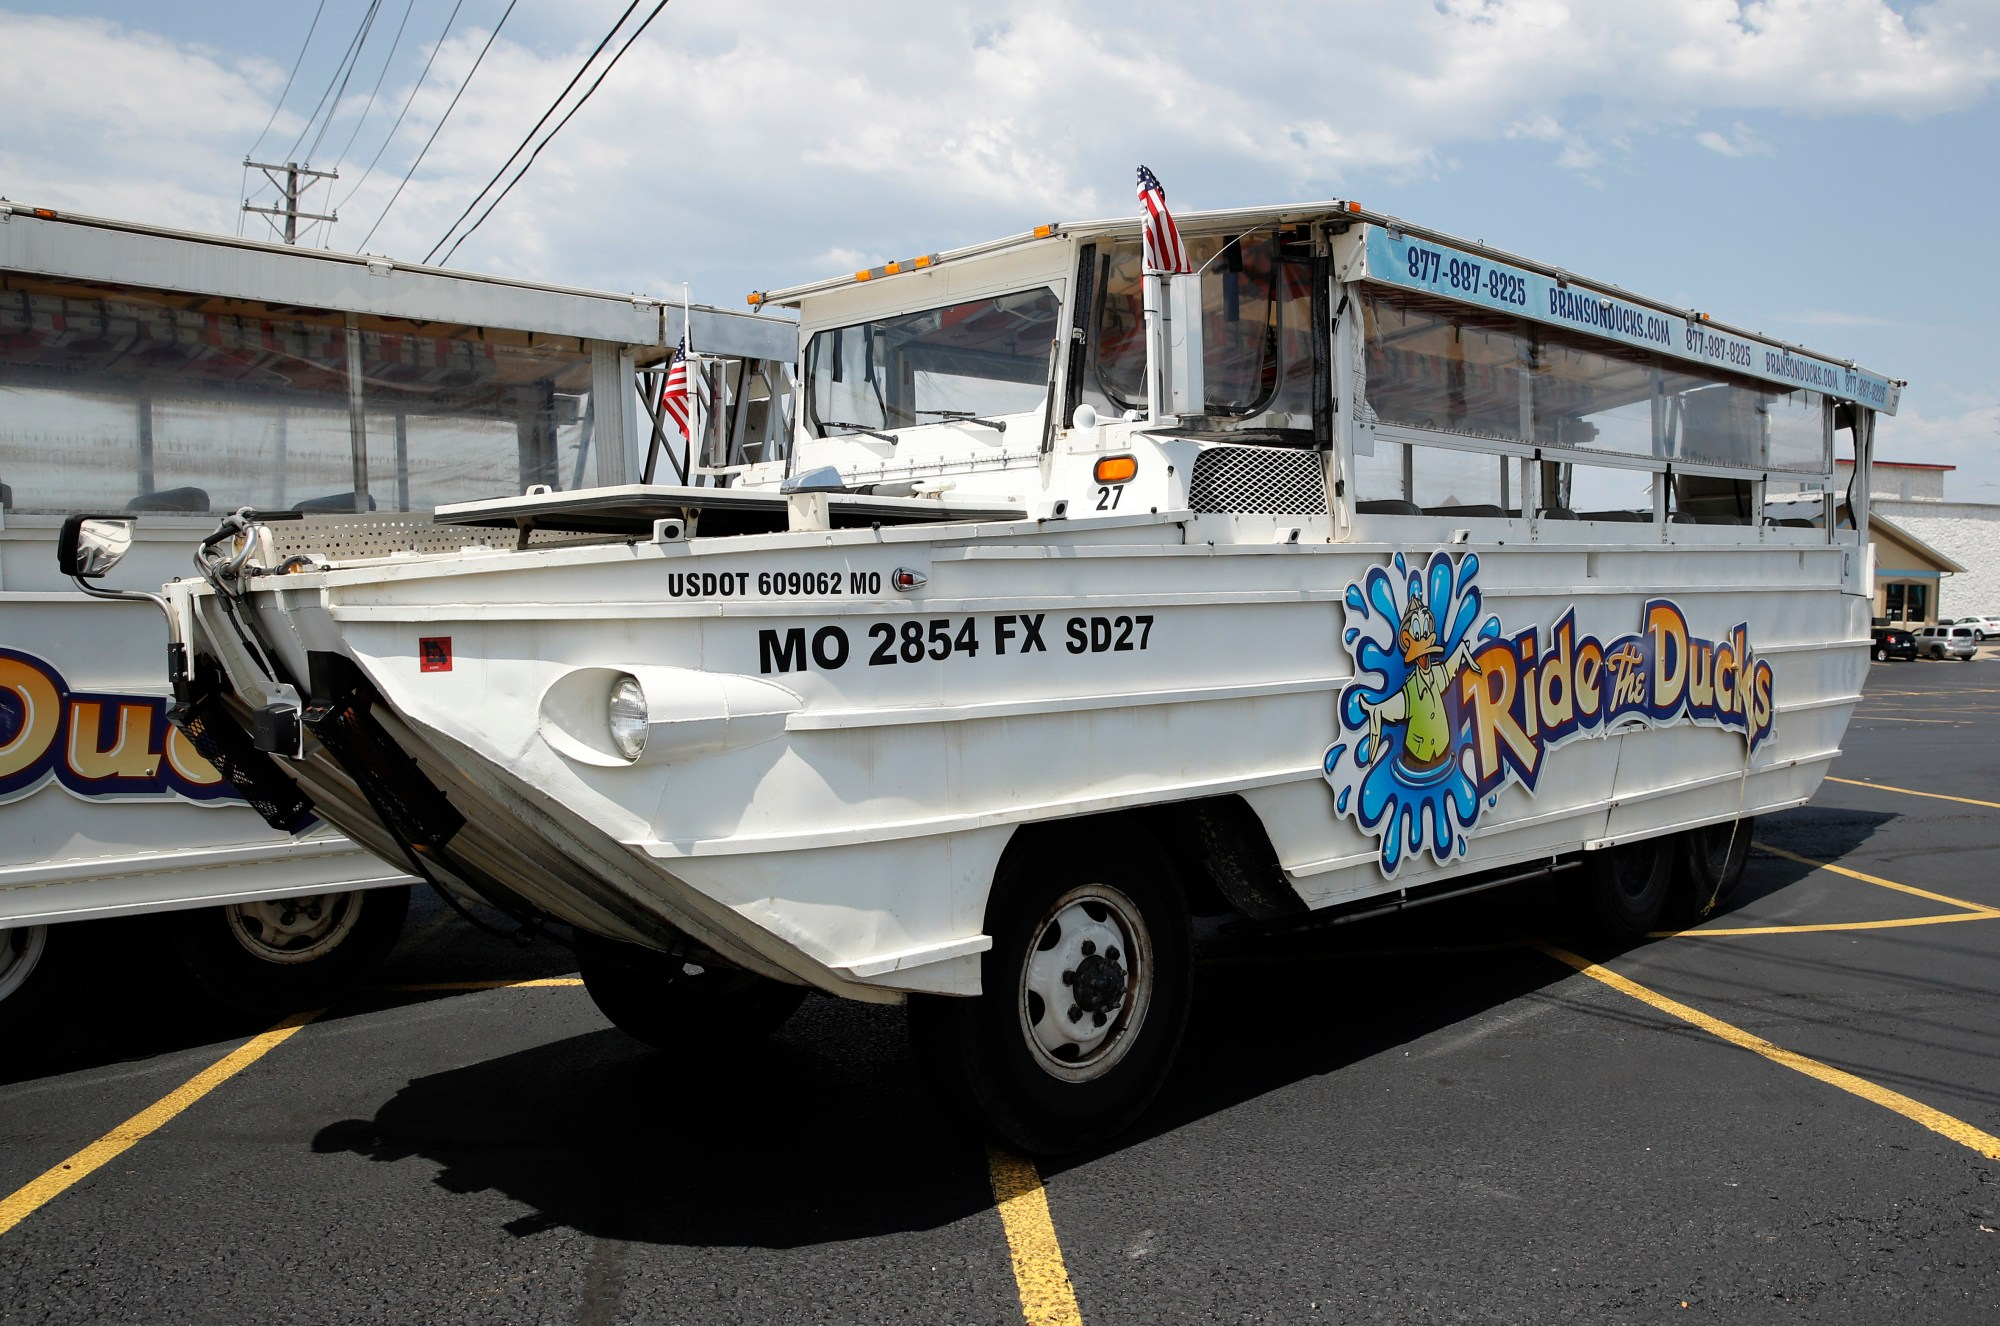 Missouri_Boat_Accident_Duck_Boats_43143-159532-159532.jpg39869346